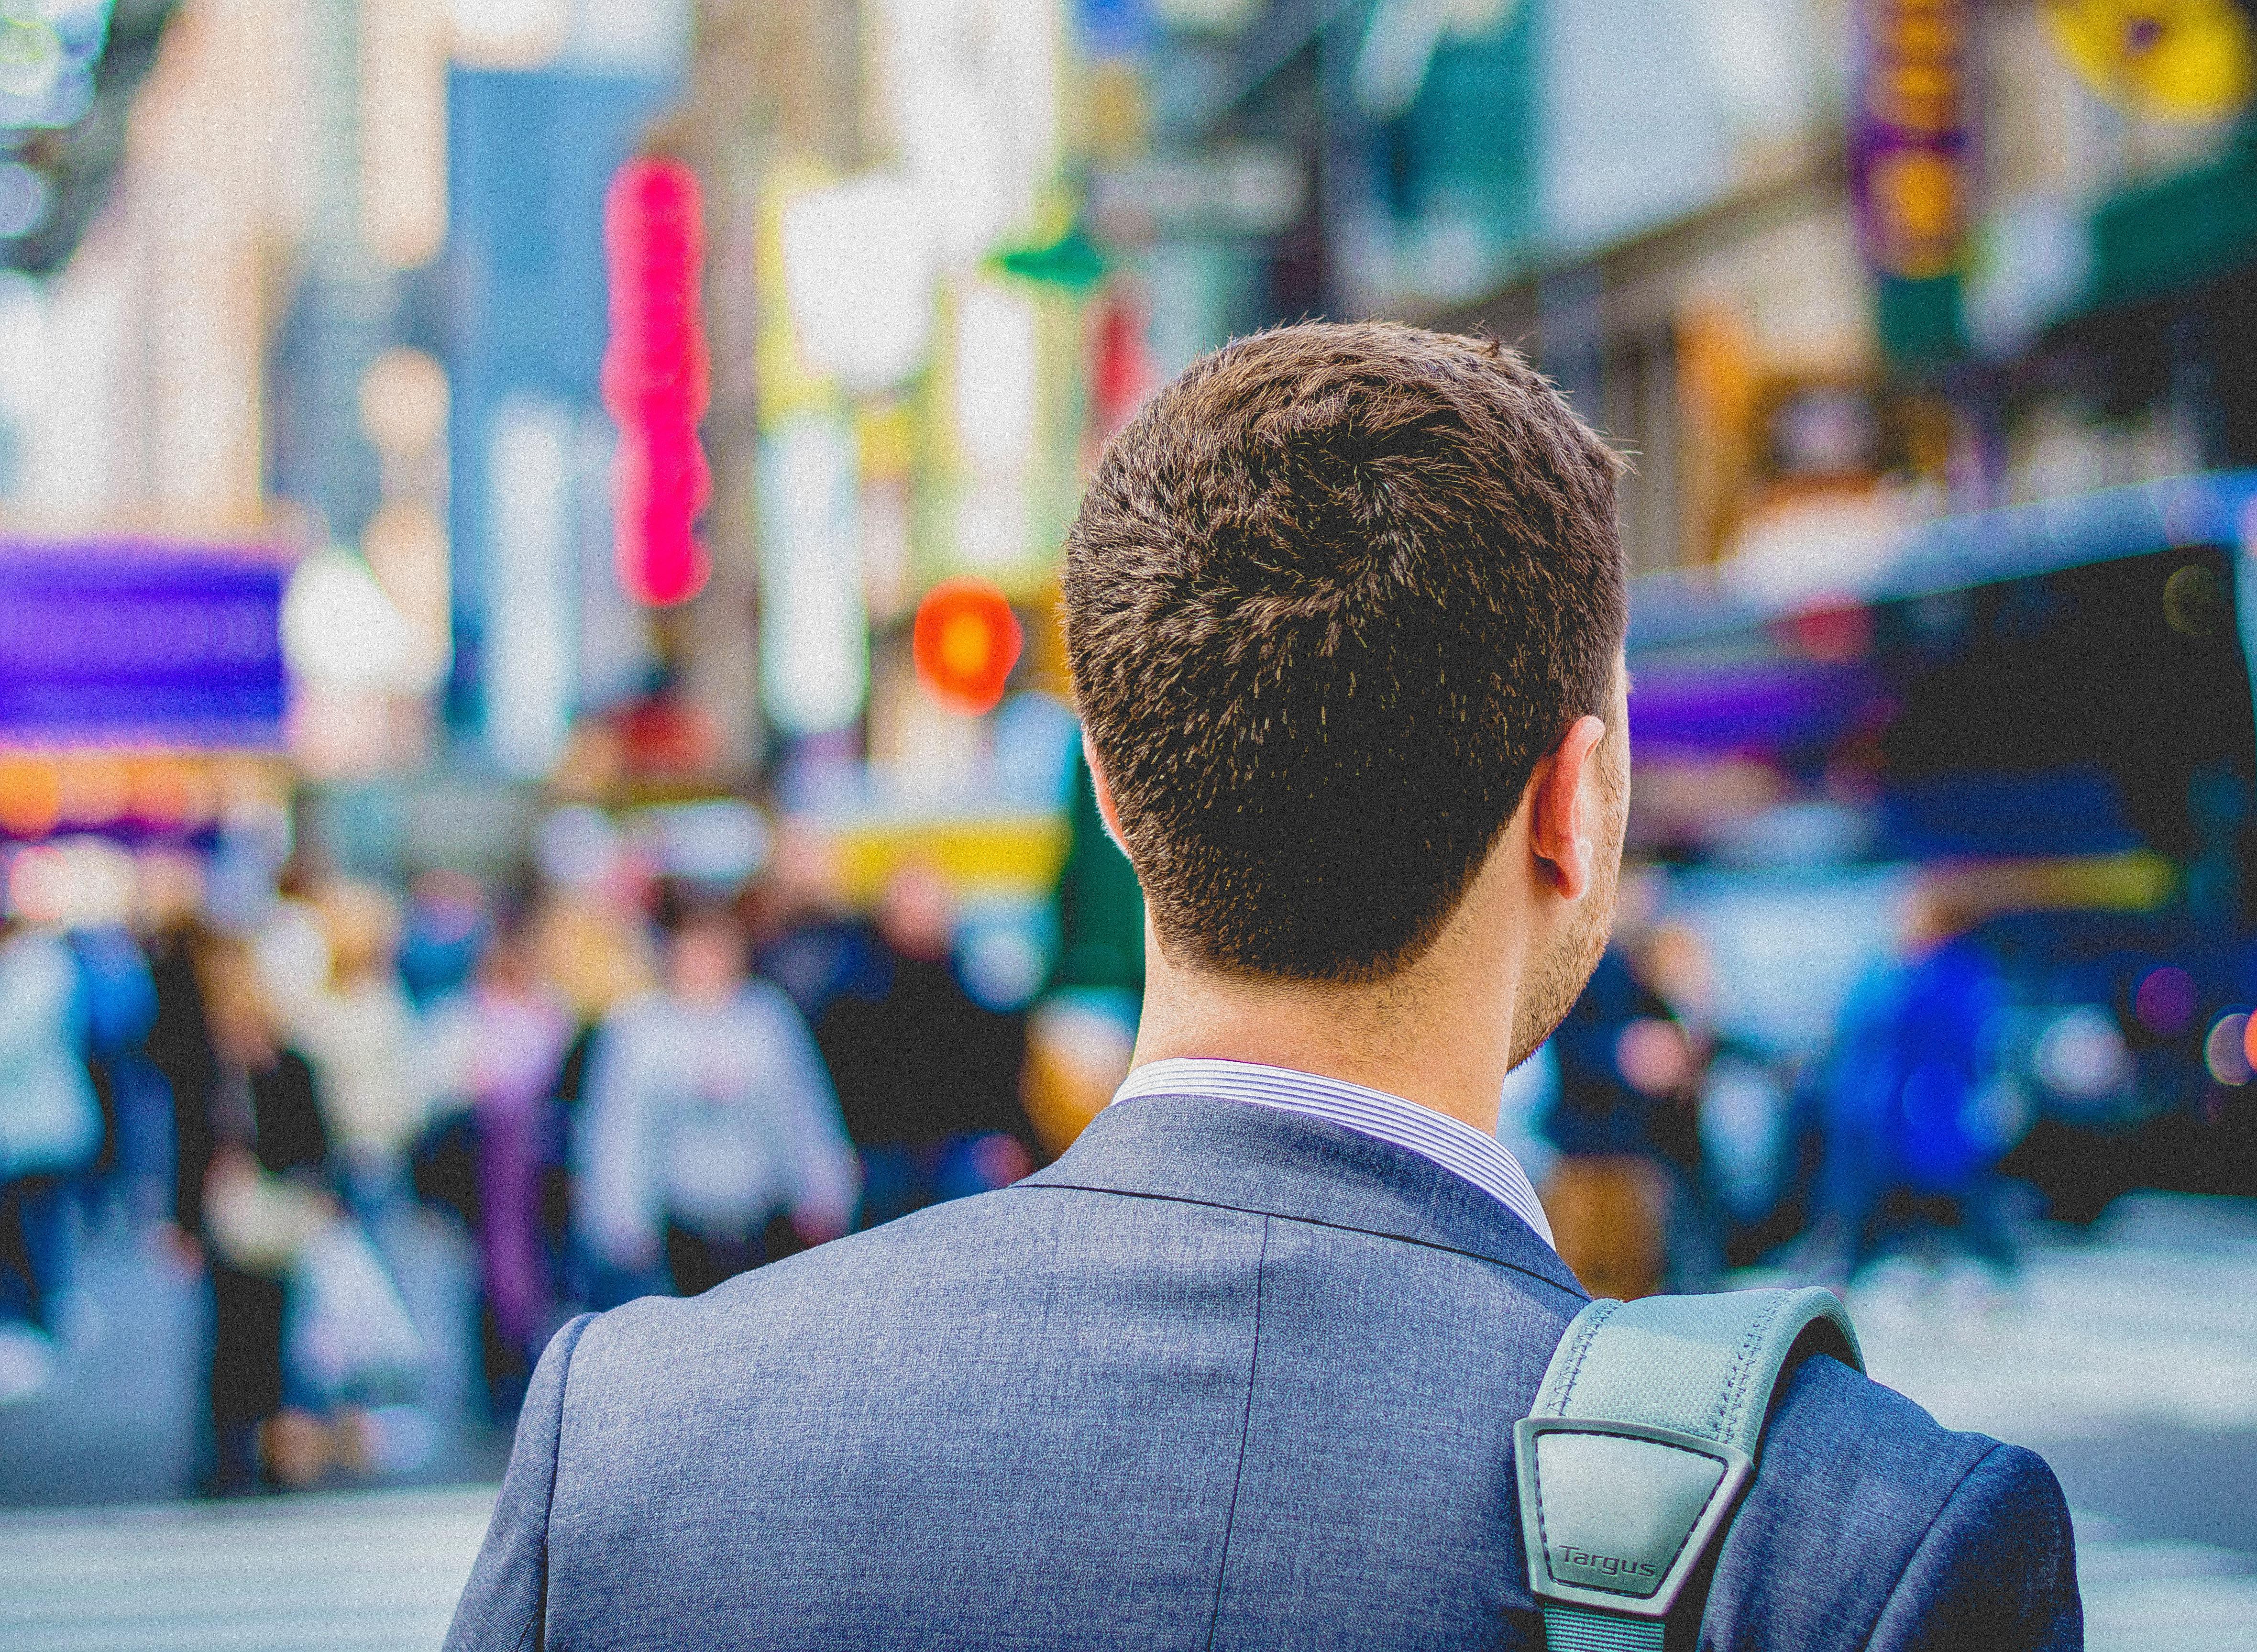 Businessman walking the streets with shoulder bag